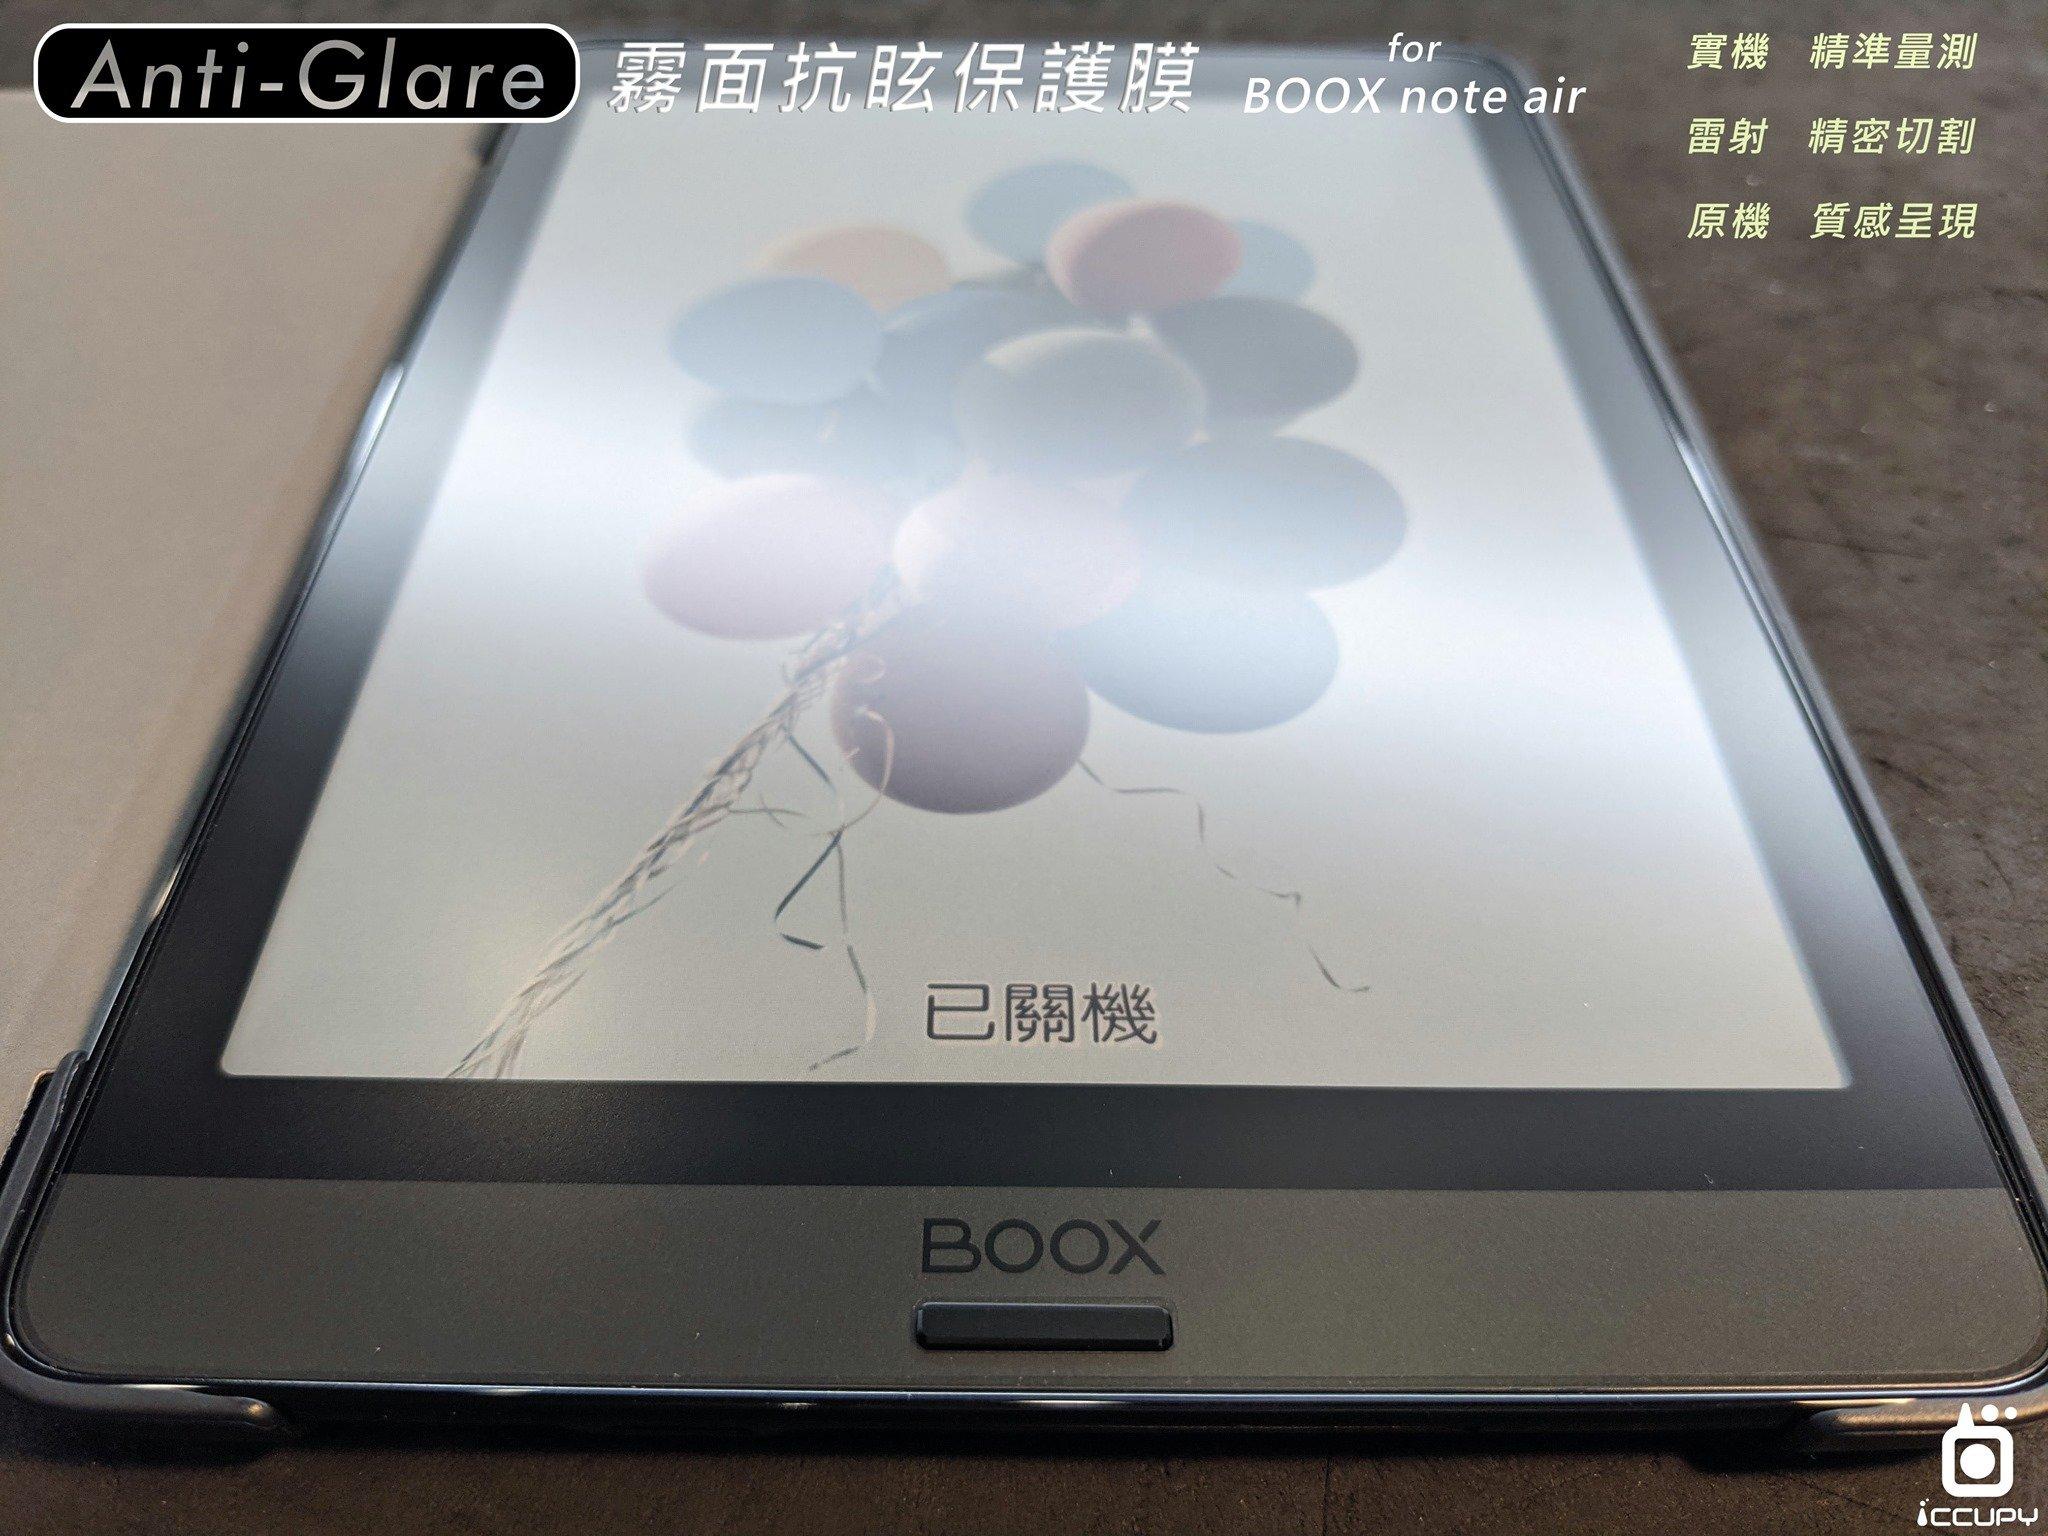 【iCCUPY】霧面 AG 抗眩防汙液晶 螢幕保護貼,文石 Onyx Boox Nova3 Color 電子書閱讀器